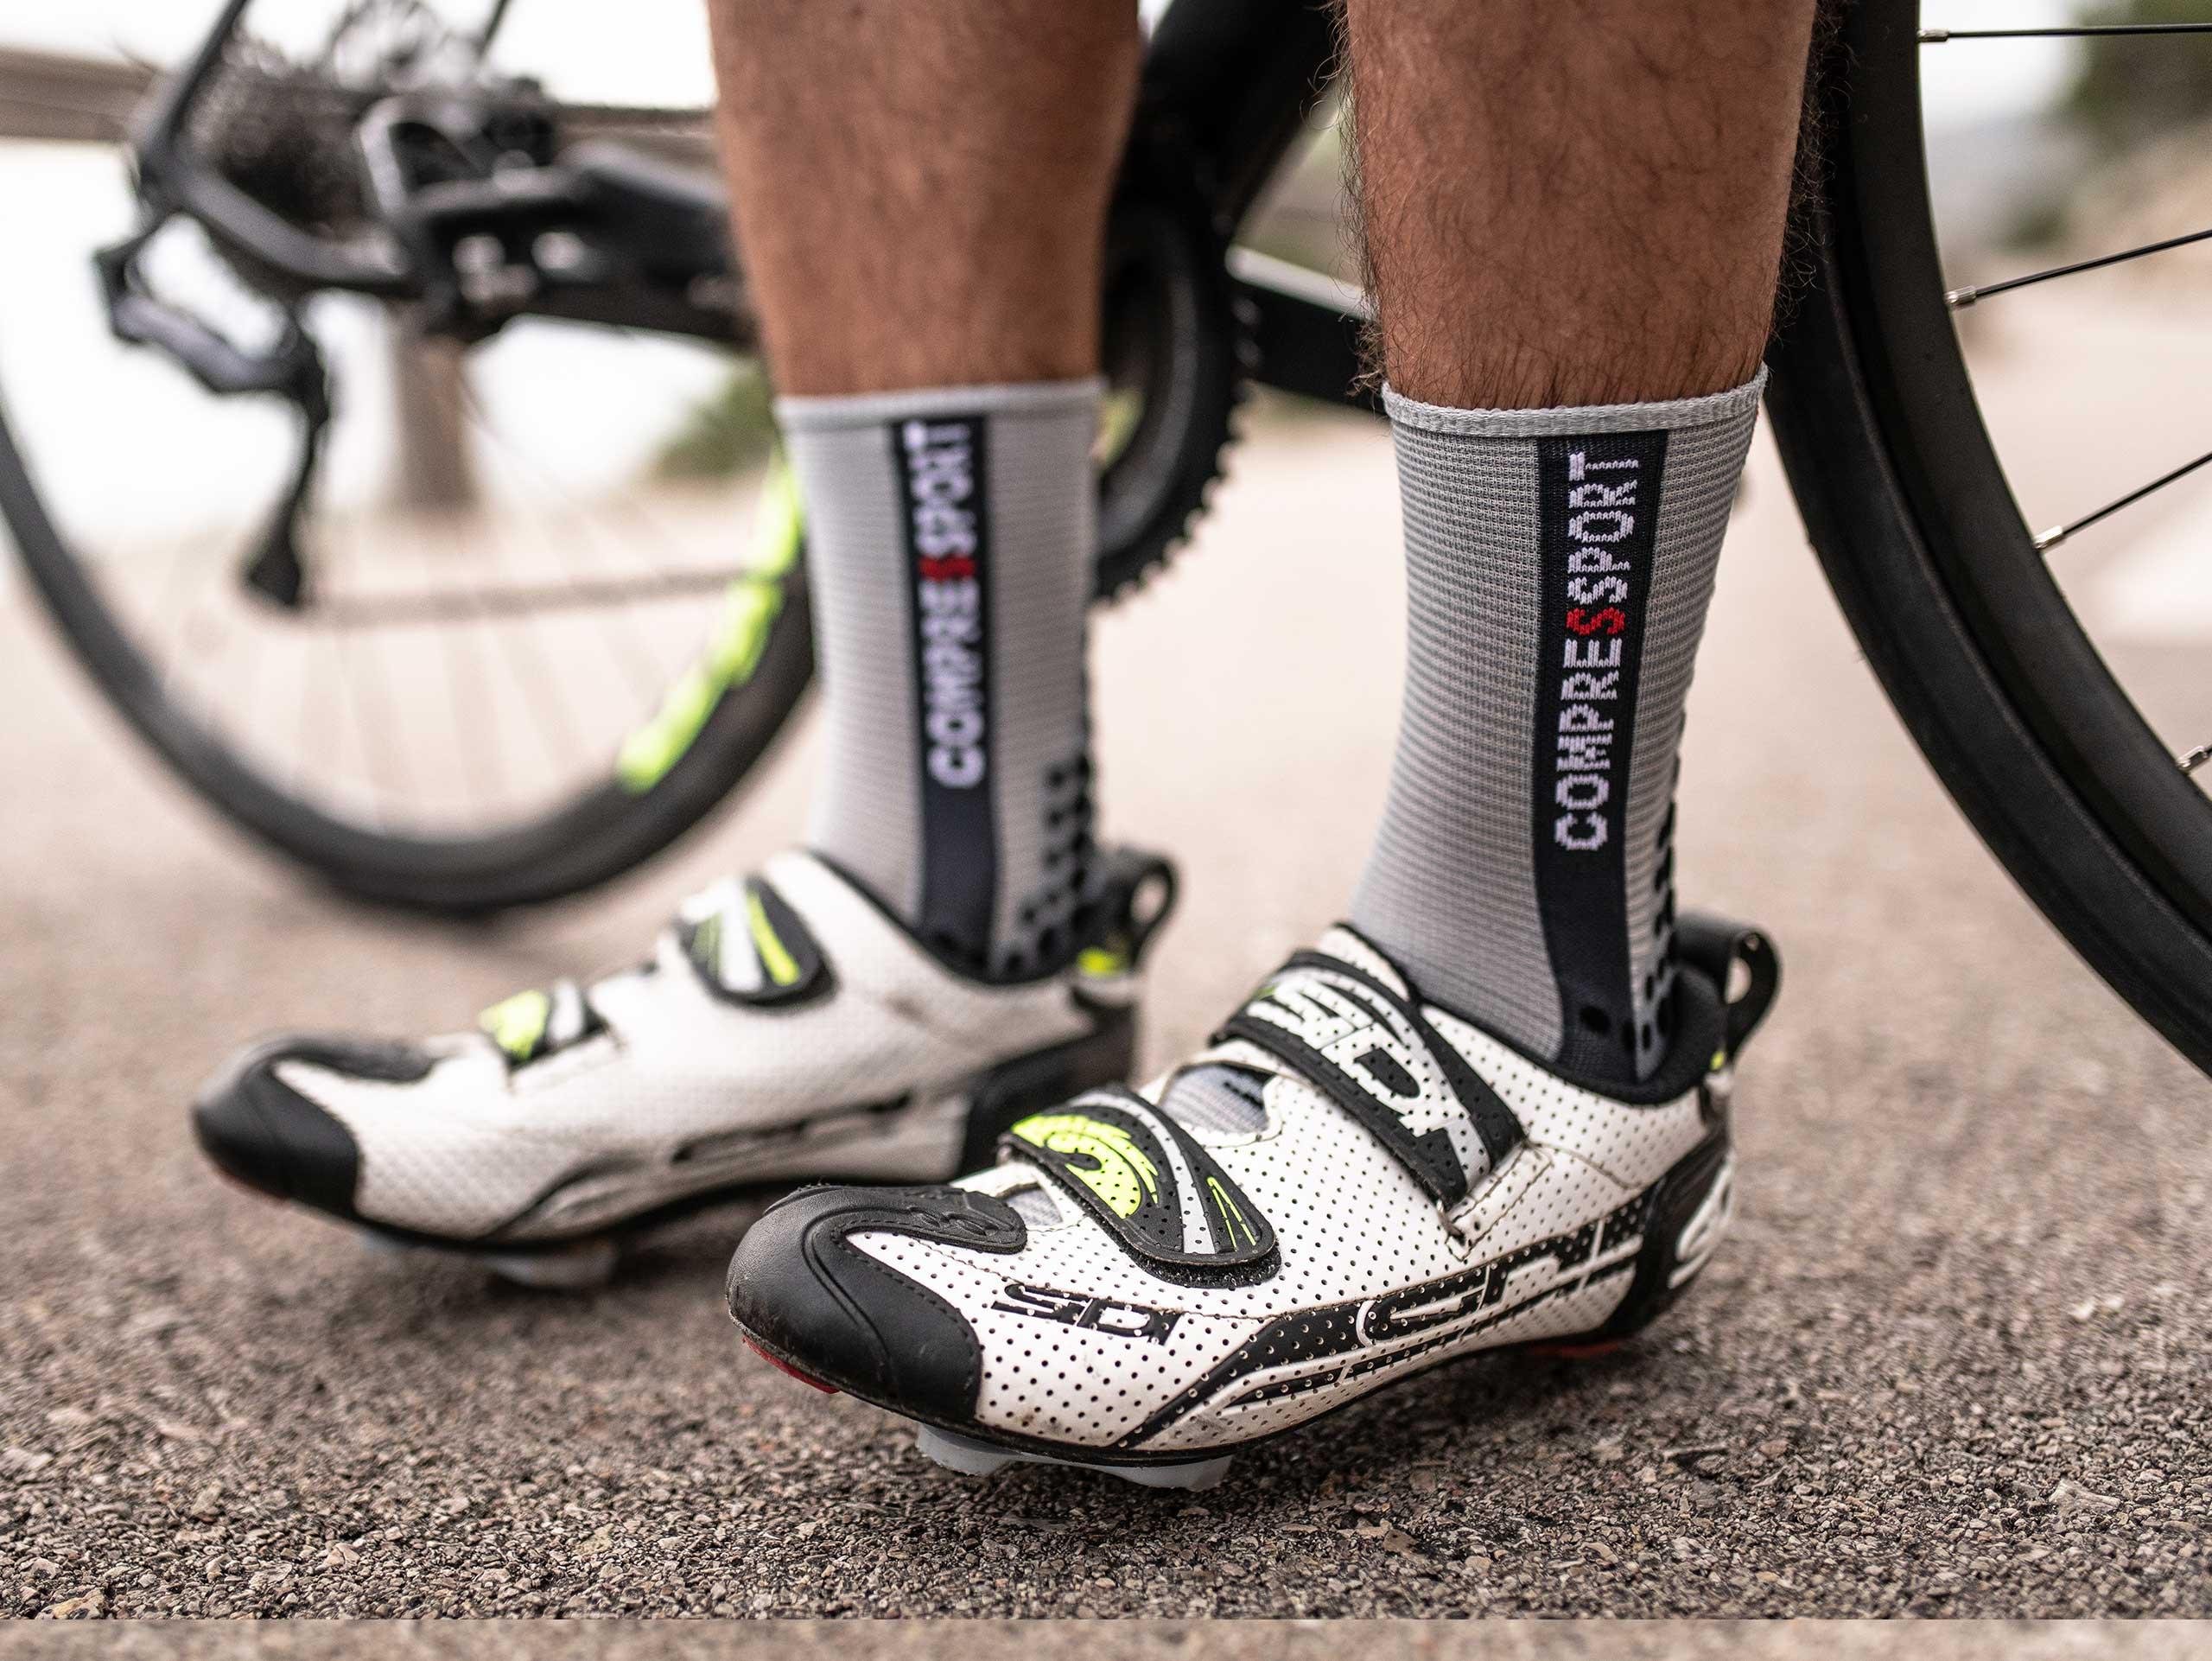 Calcetines Pro Racing v3.0 Bike gris jaspeado